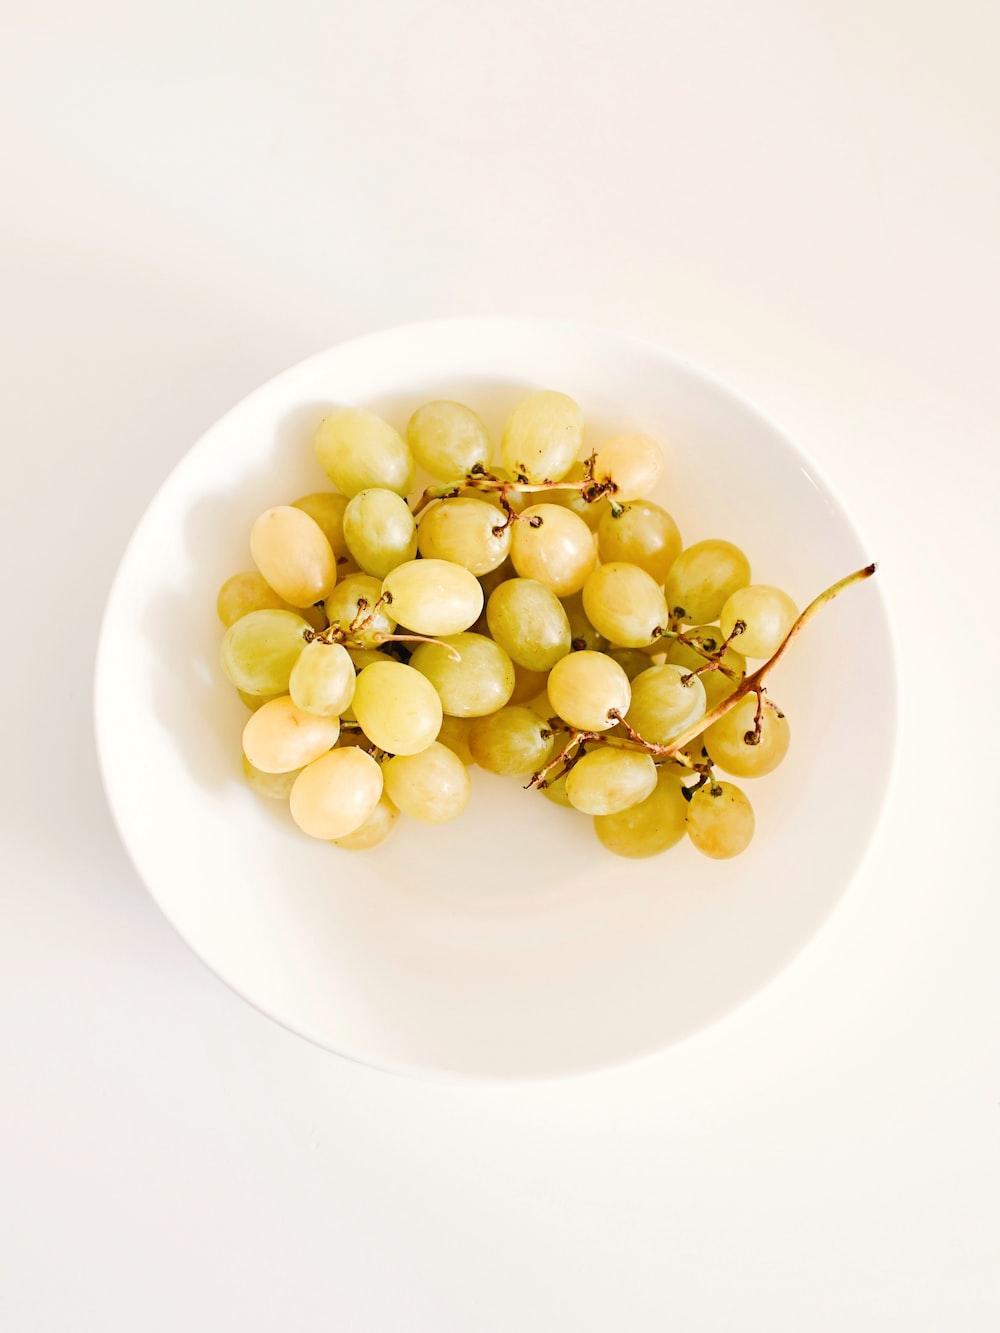 yellow round fruits on white ceramic plate